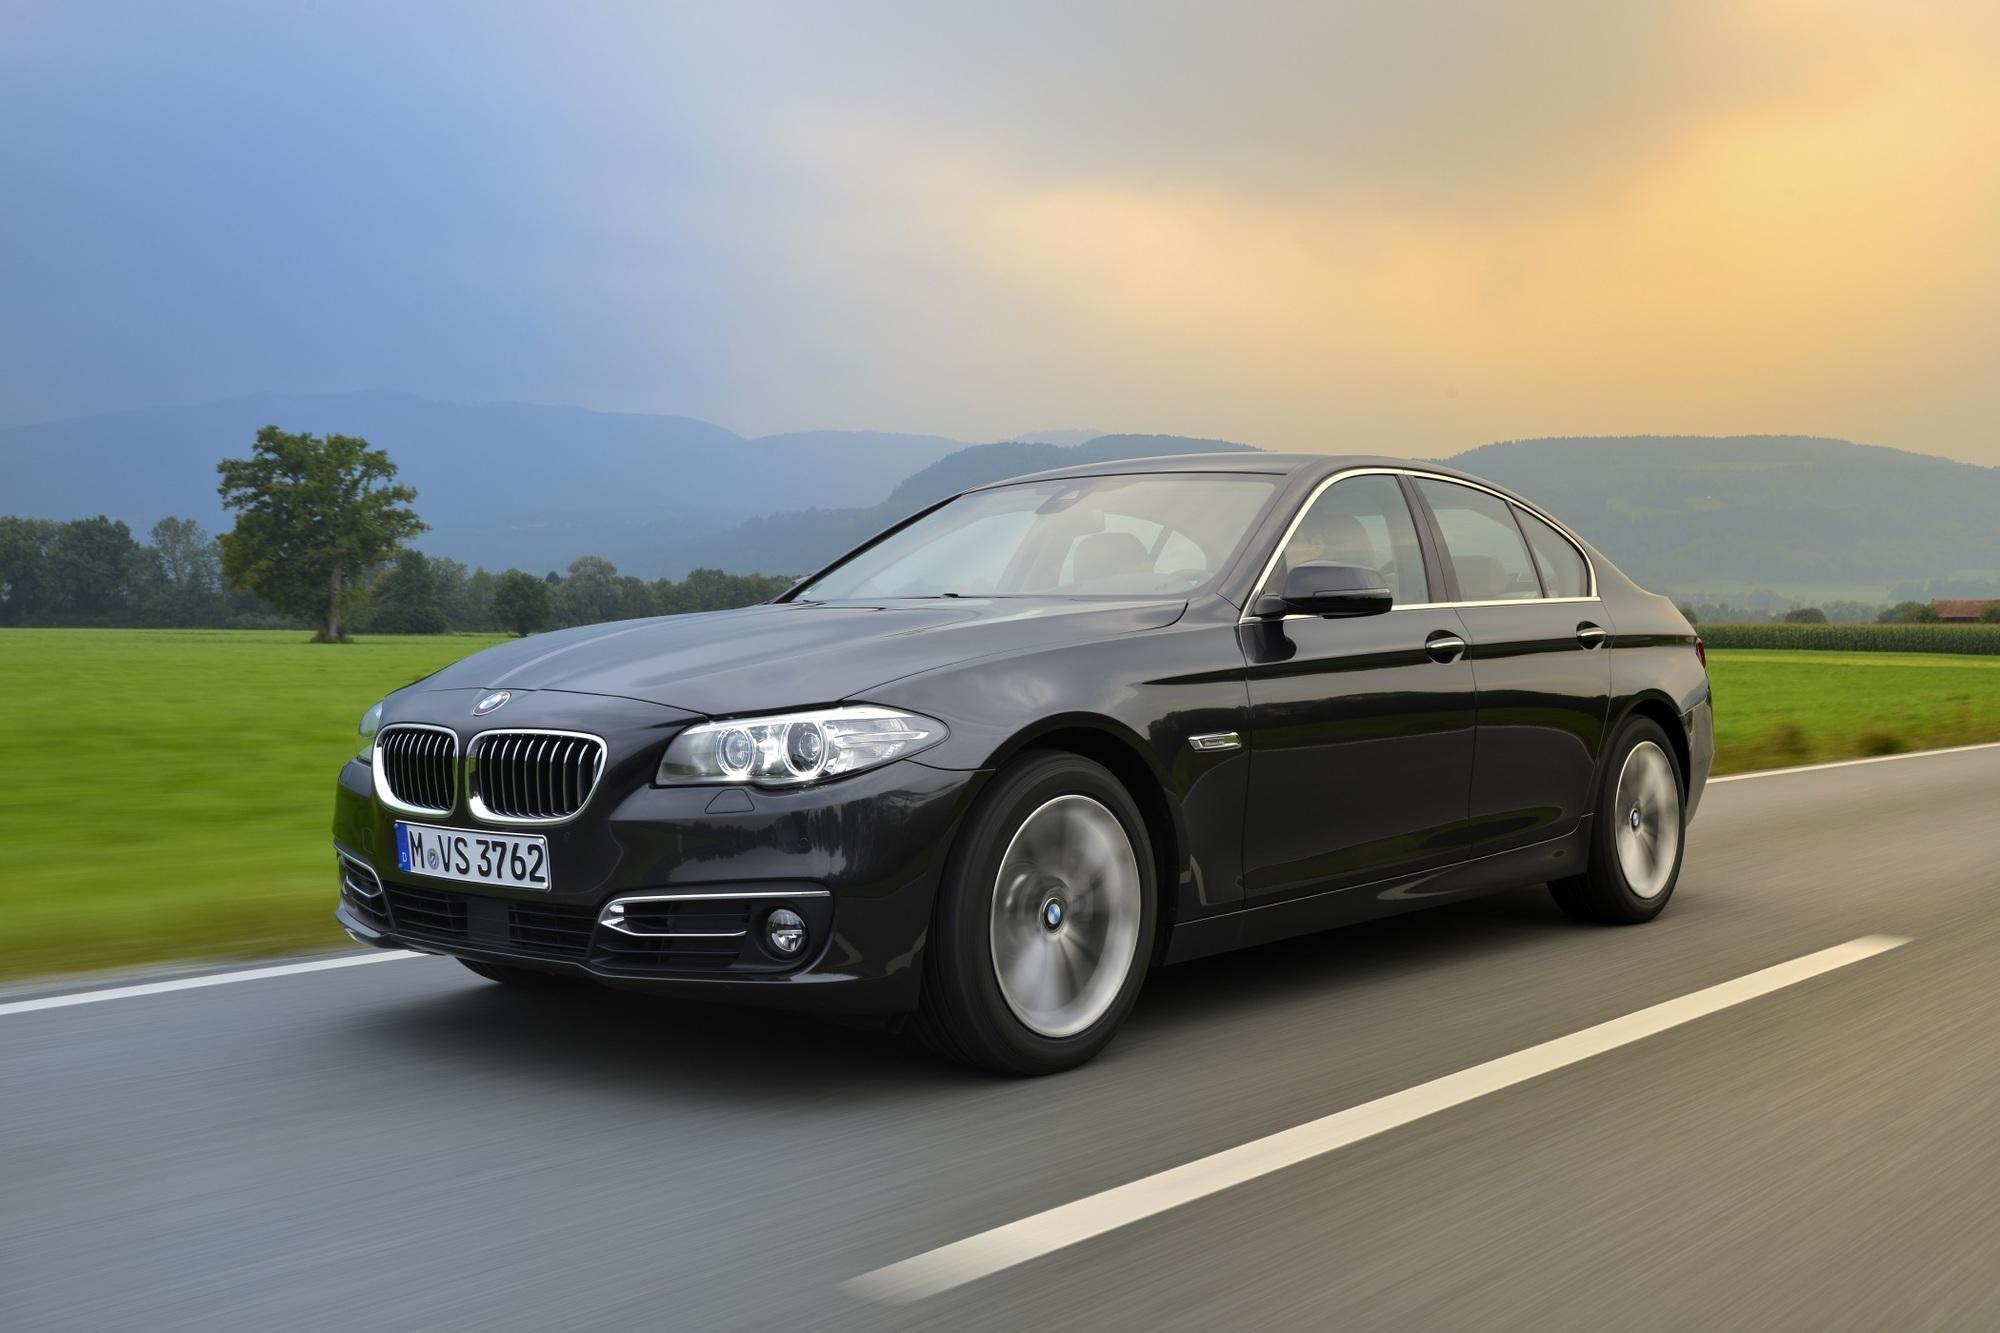 Fahrbericht: Neuer BMW 520d - Knauser auf hohem Niveau